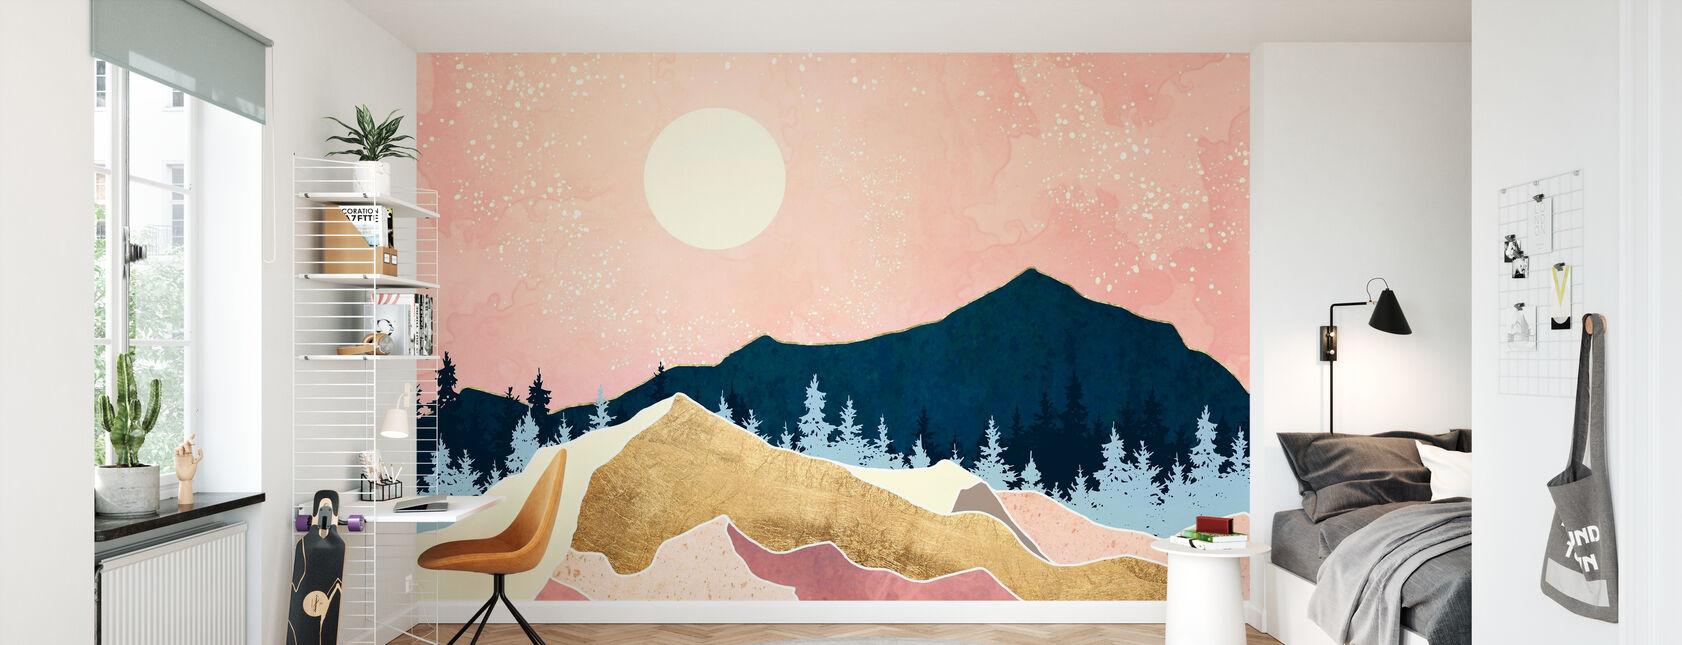 Coral Sunset - Wallpaper - Kids Room